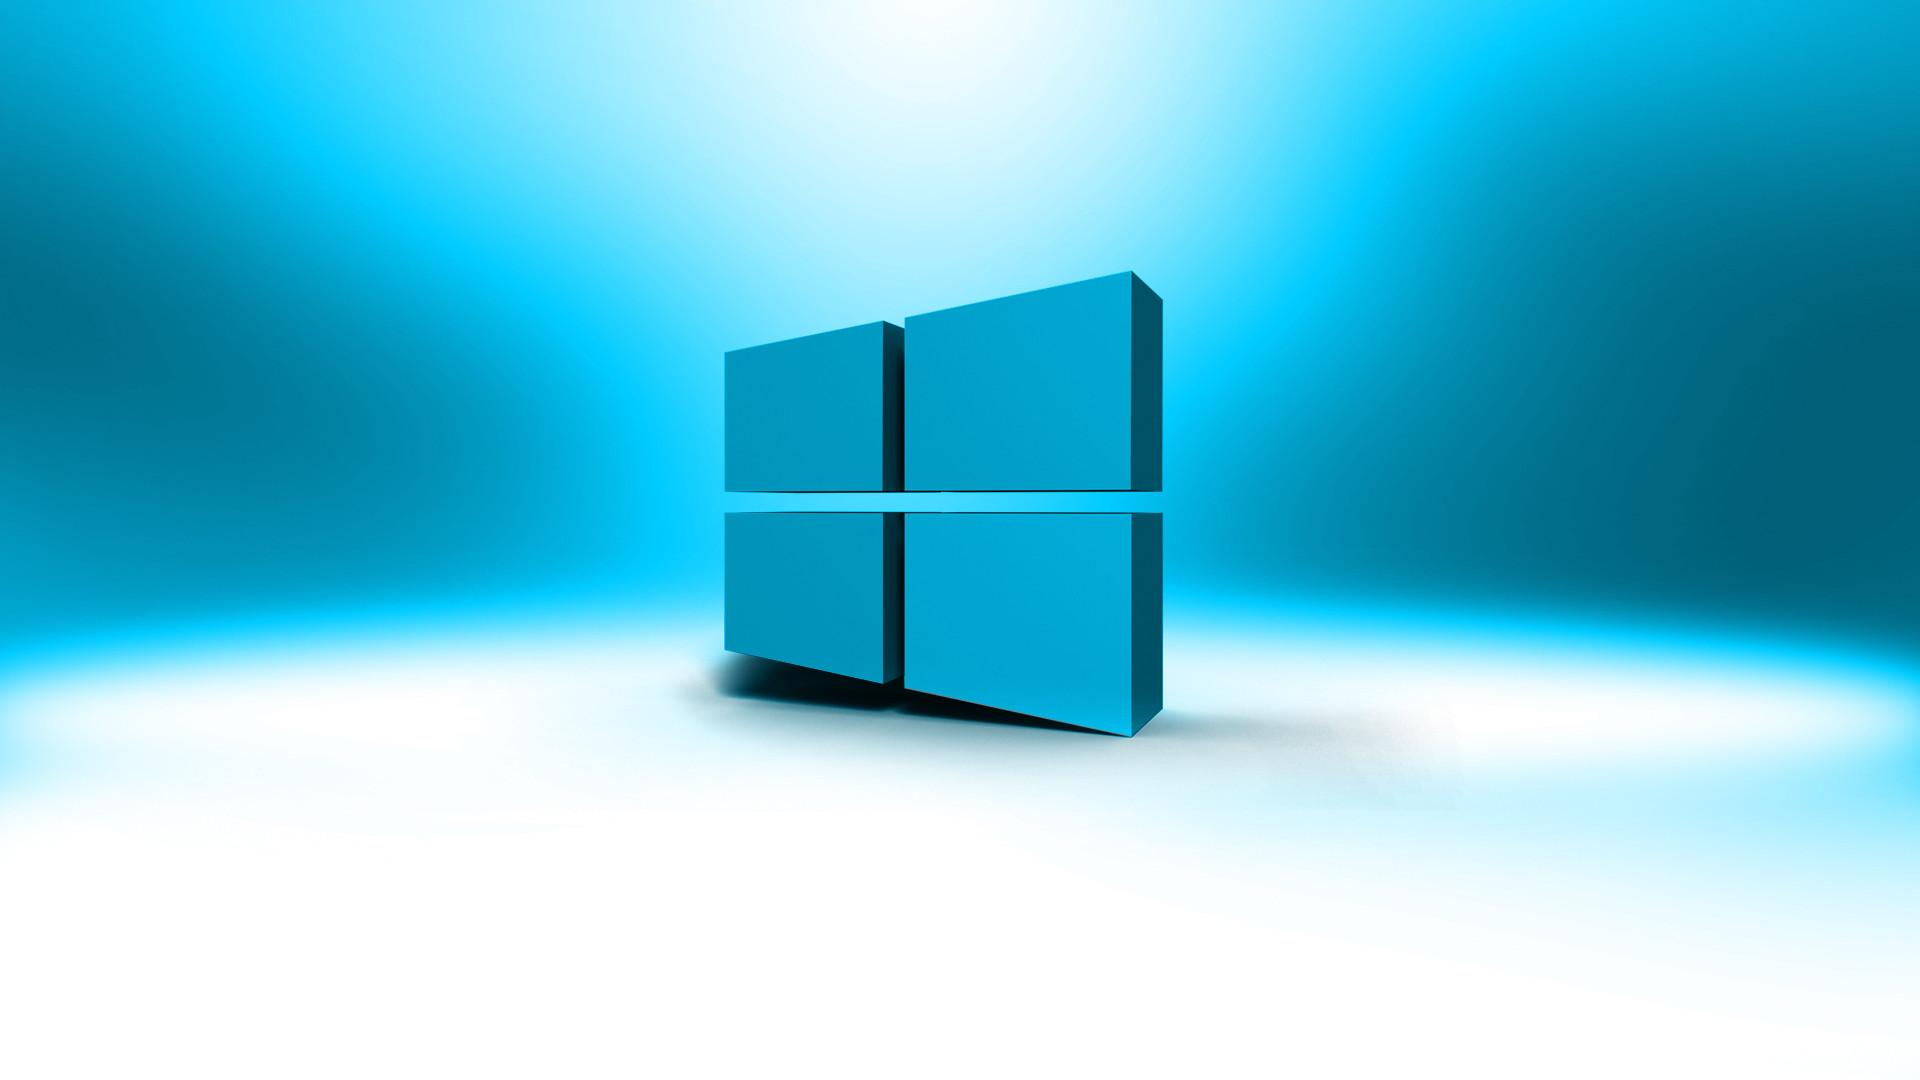 windows 10 wallpaper hd for desktop black…